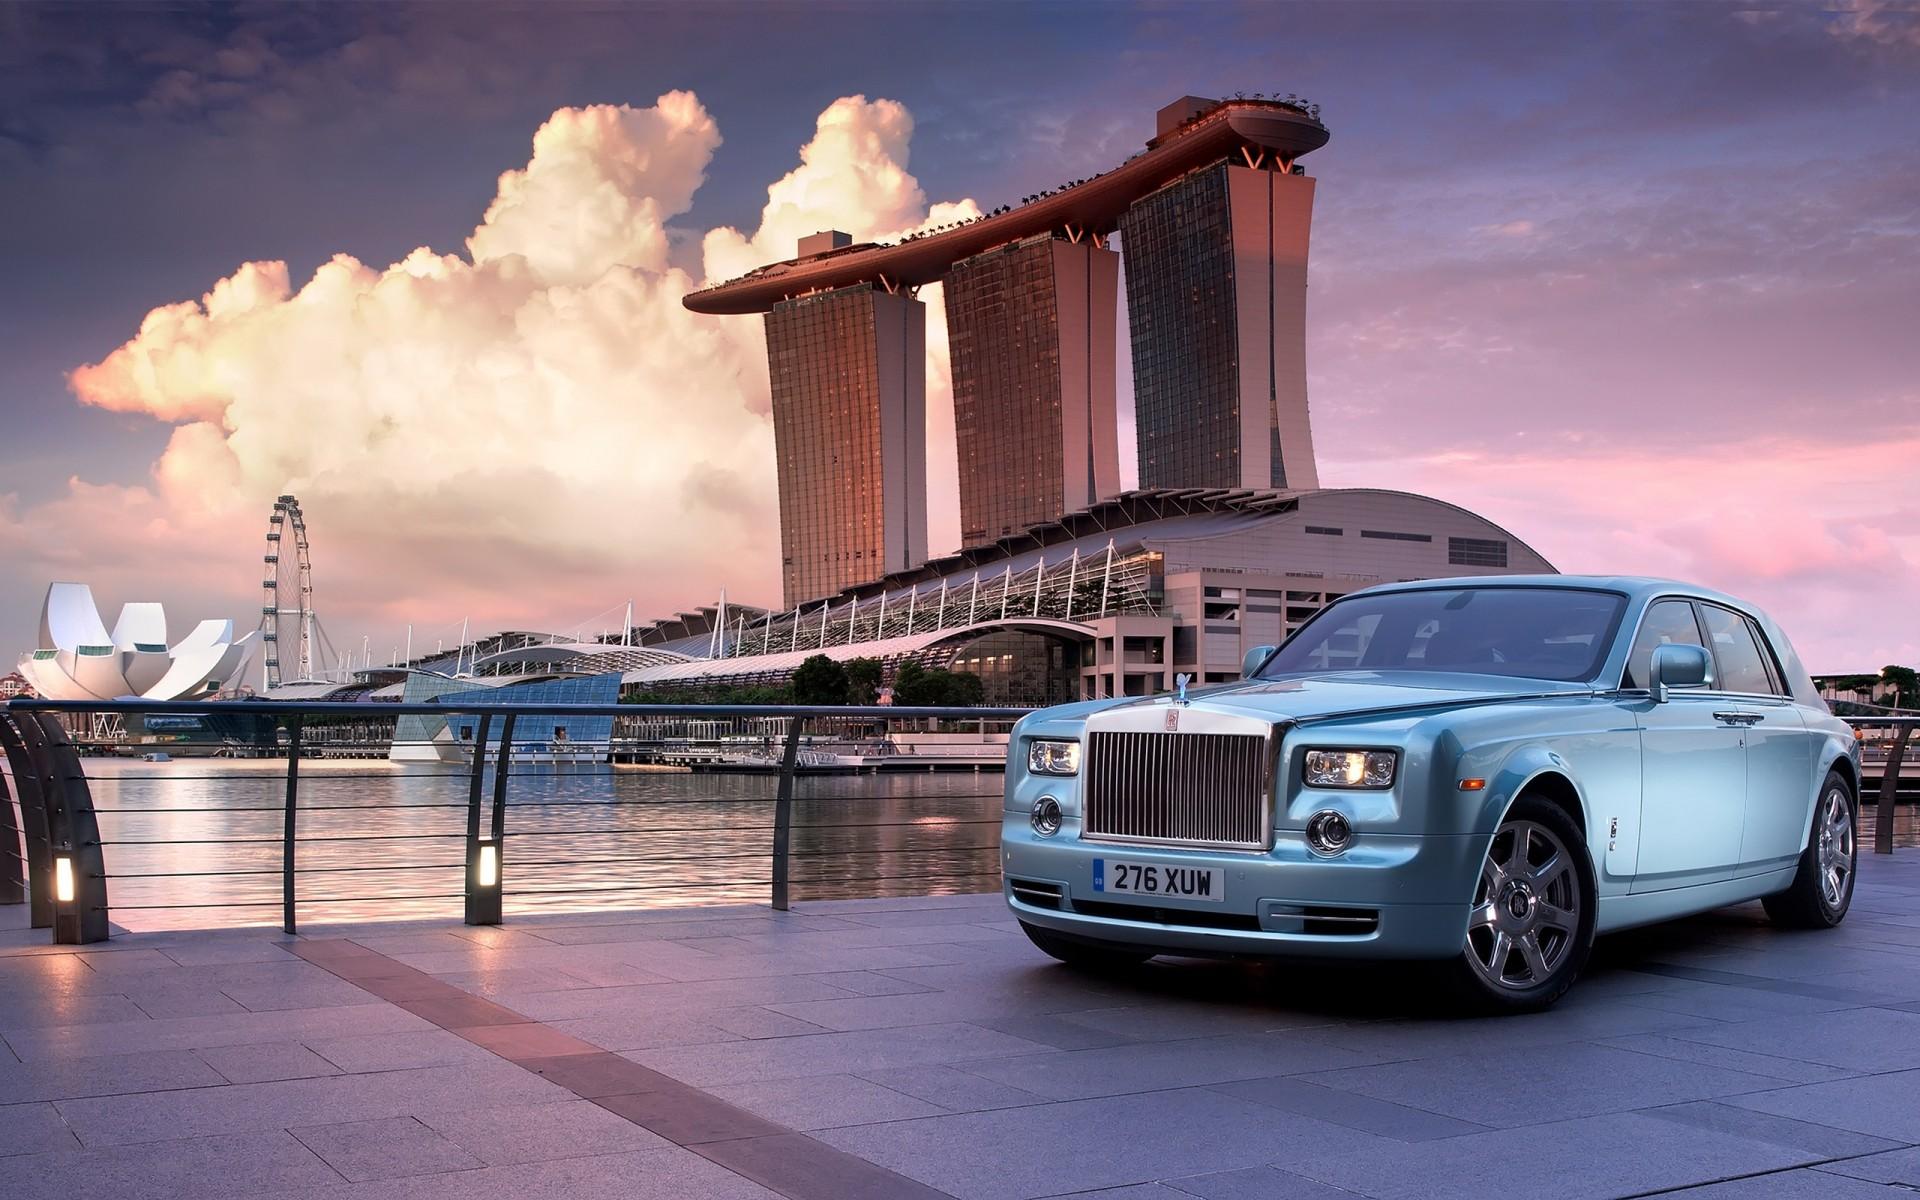 Rolls Royce Phantom 102ex Iphone Wallpapers For Free